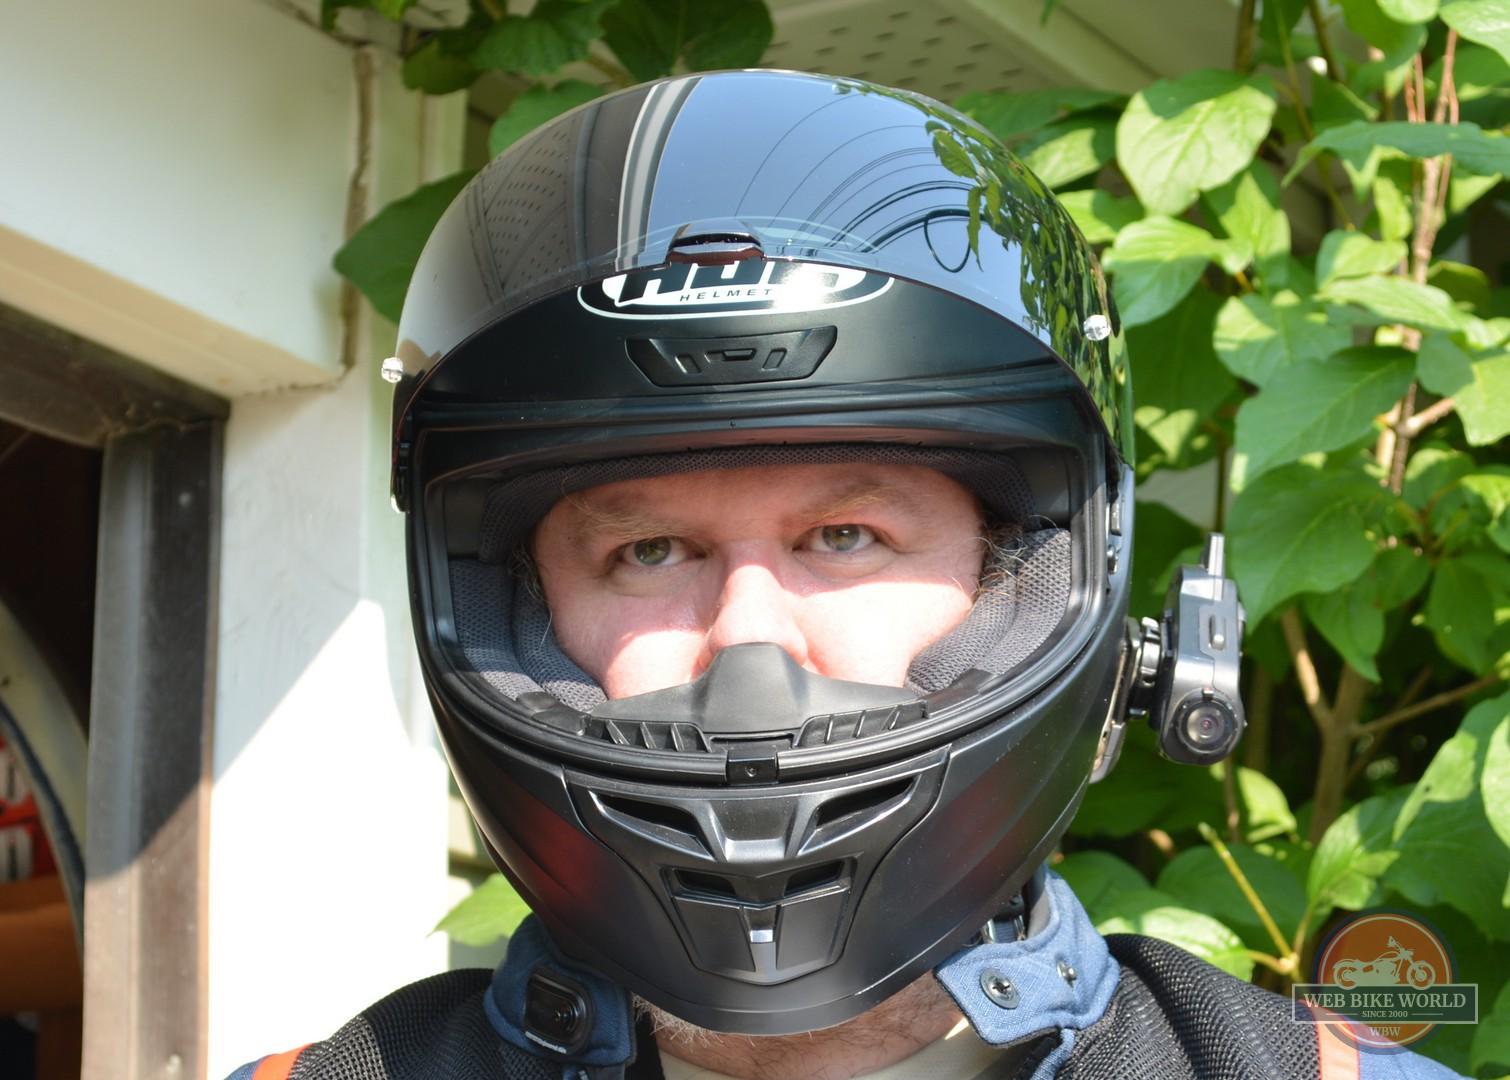 Front view of rider wearing HJC i10 helmet